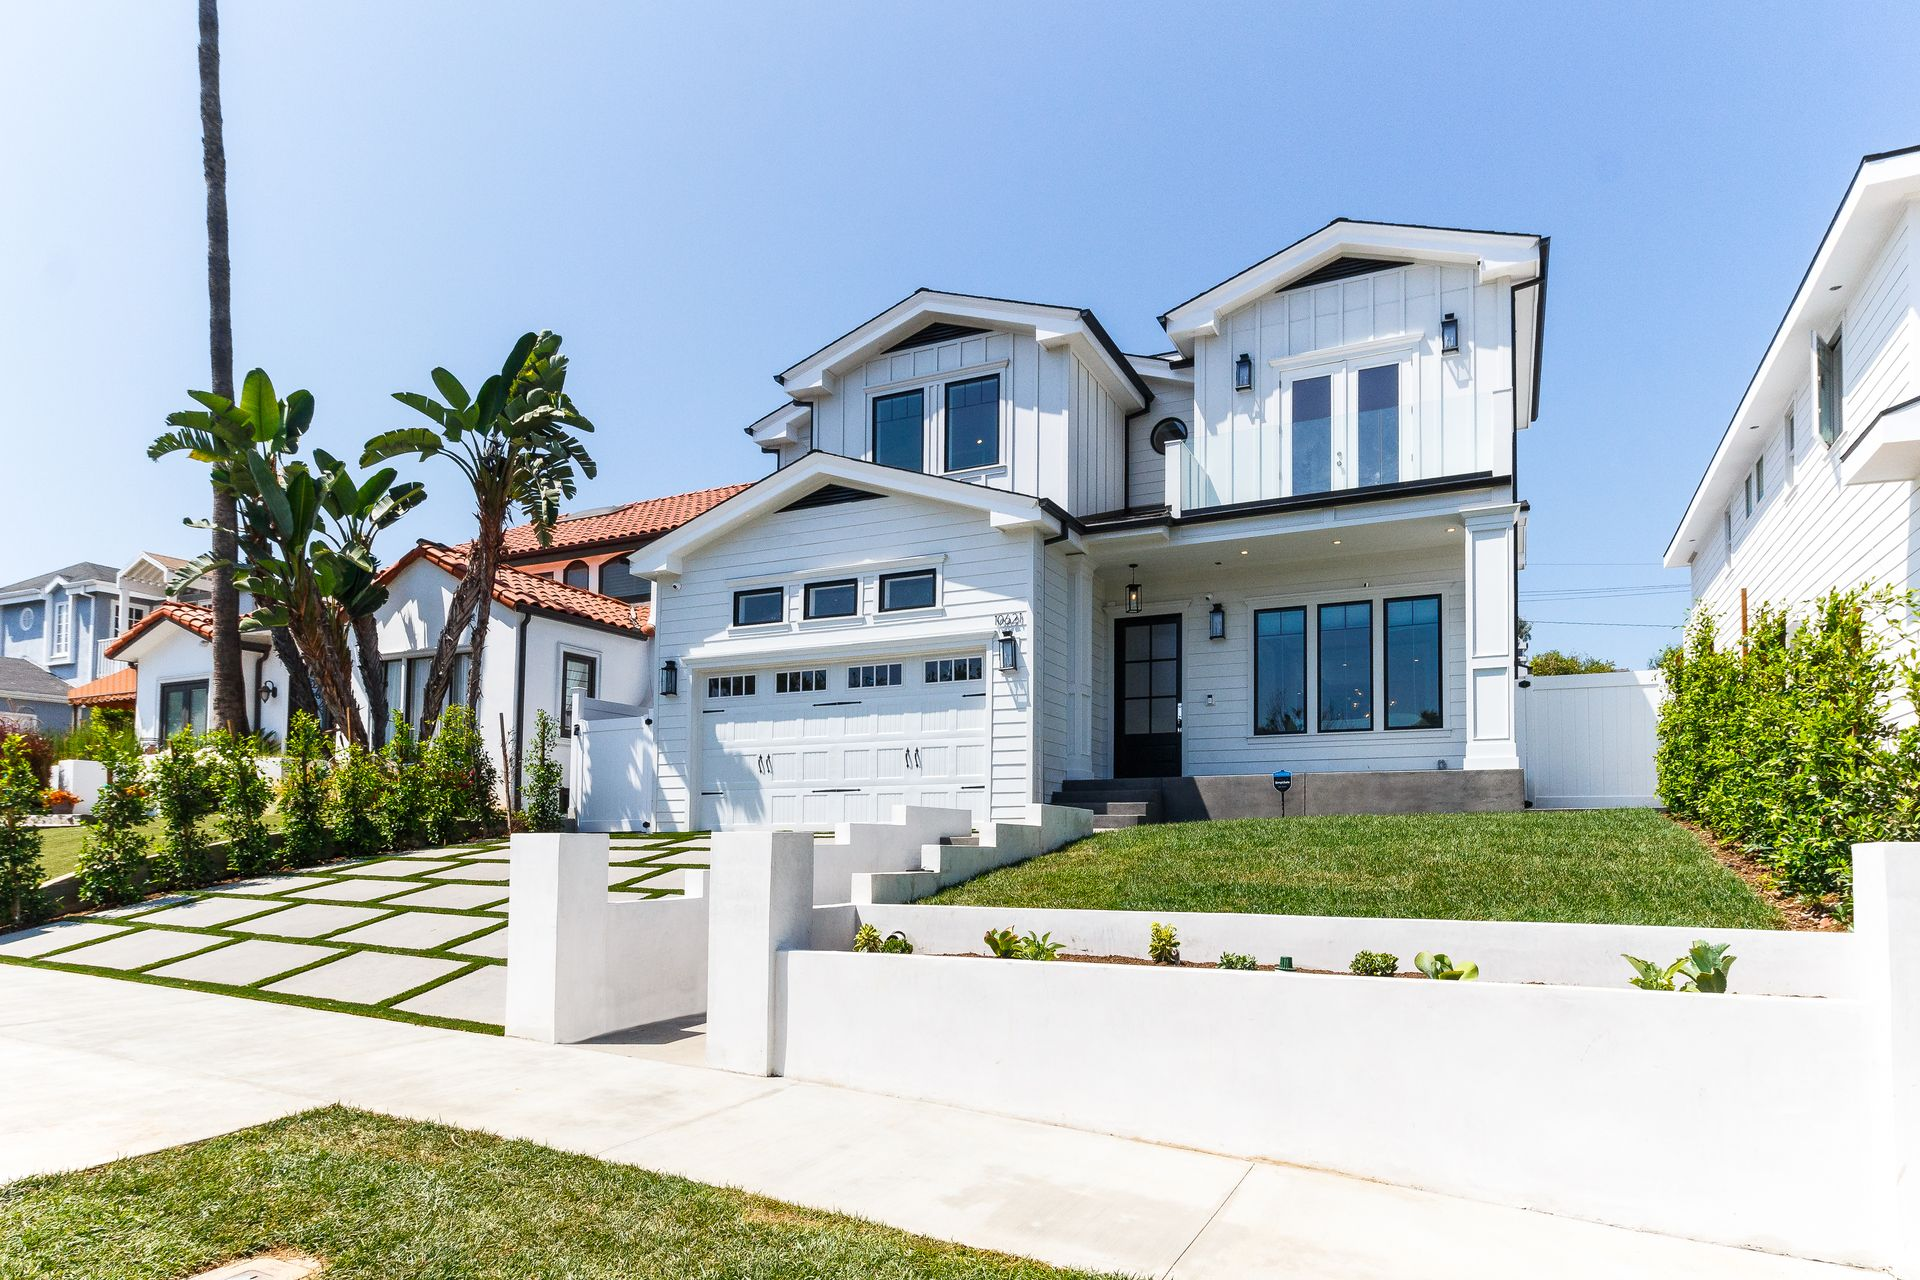 827 N Curson Ave.,los angeles,California,United States 90046,House,N Curson Ave.,1041